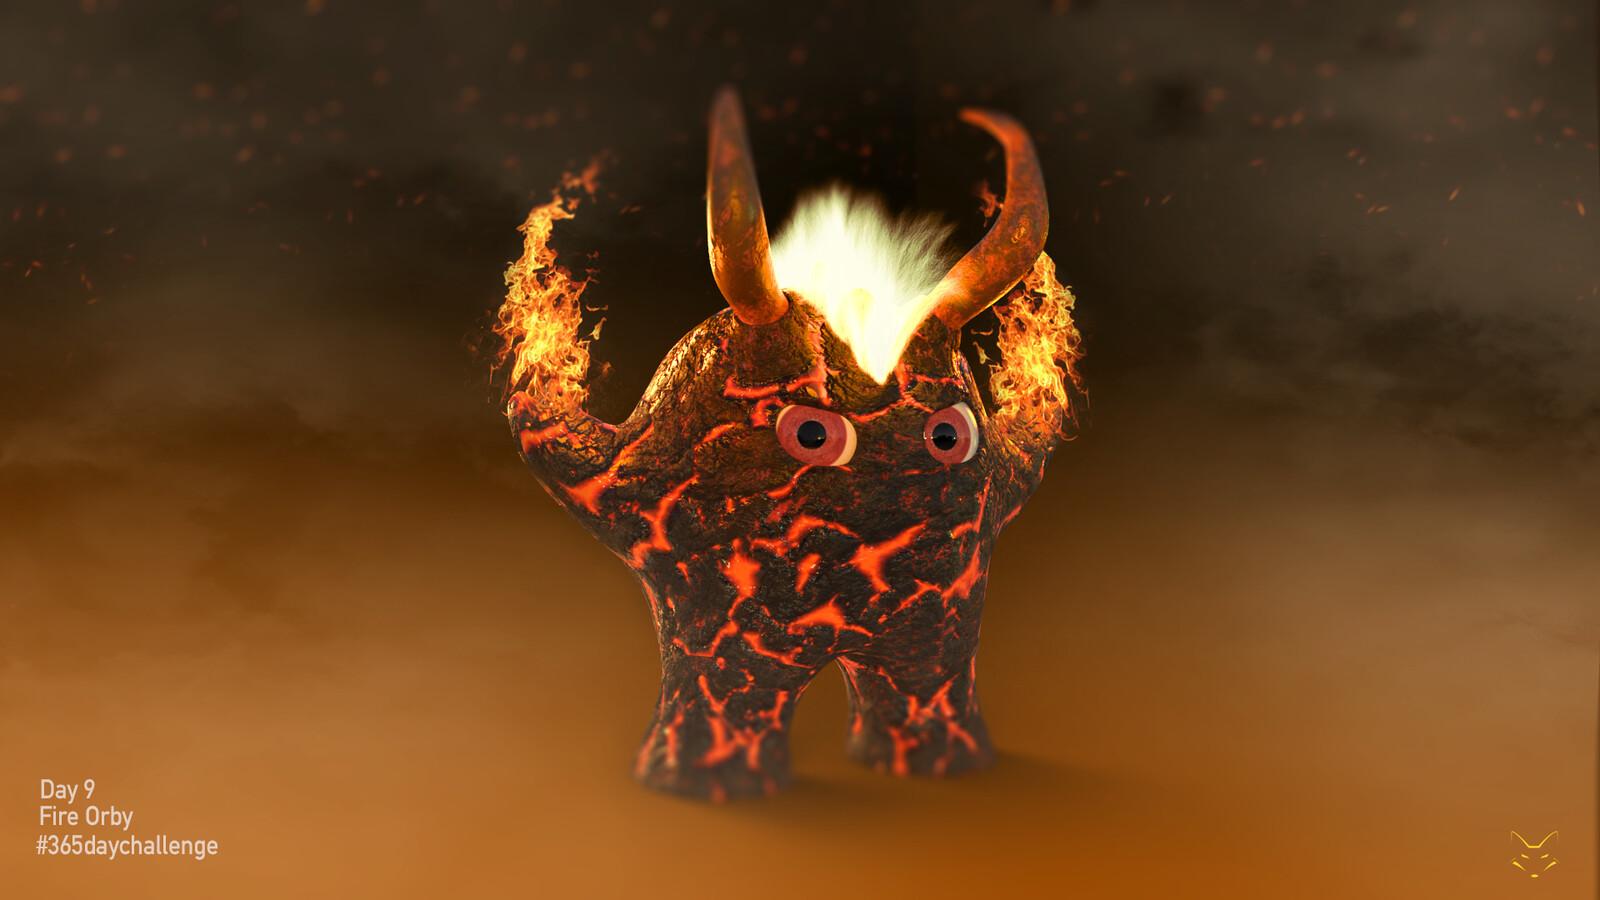 Fire Orby